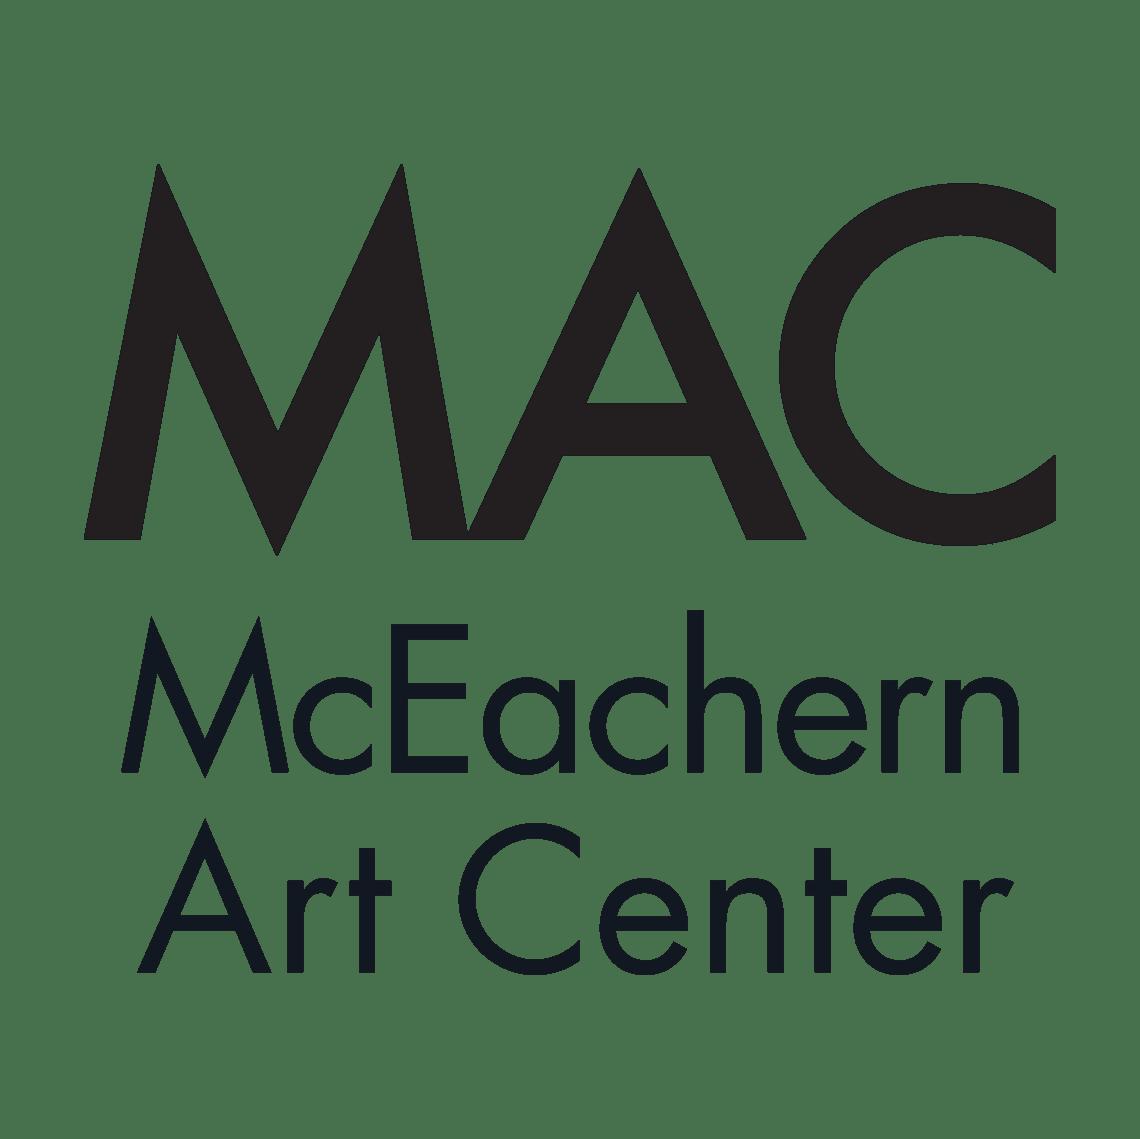 MAC_WORDMARK_MCEACHERN